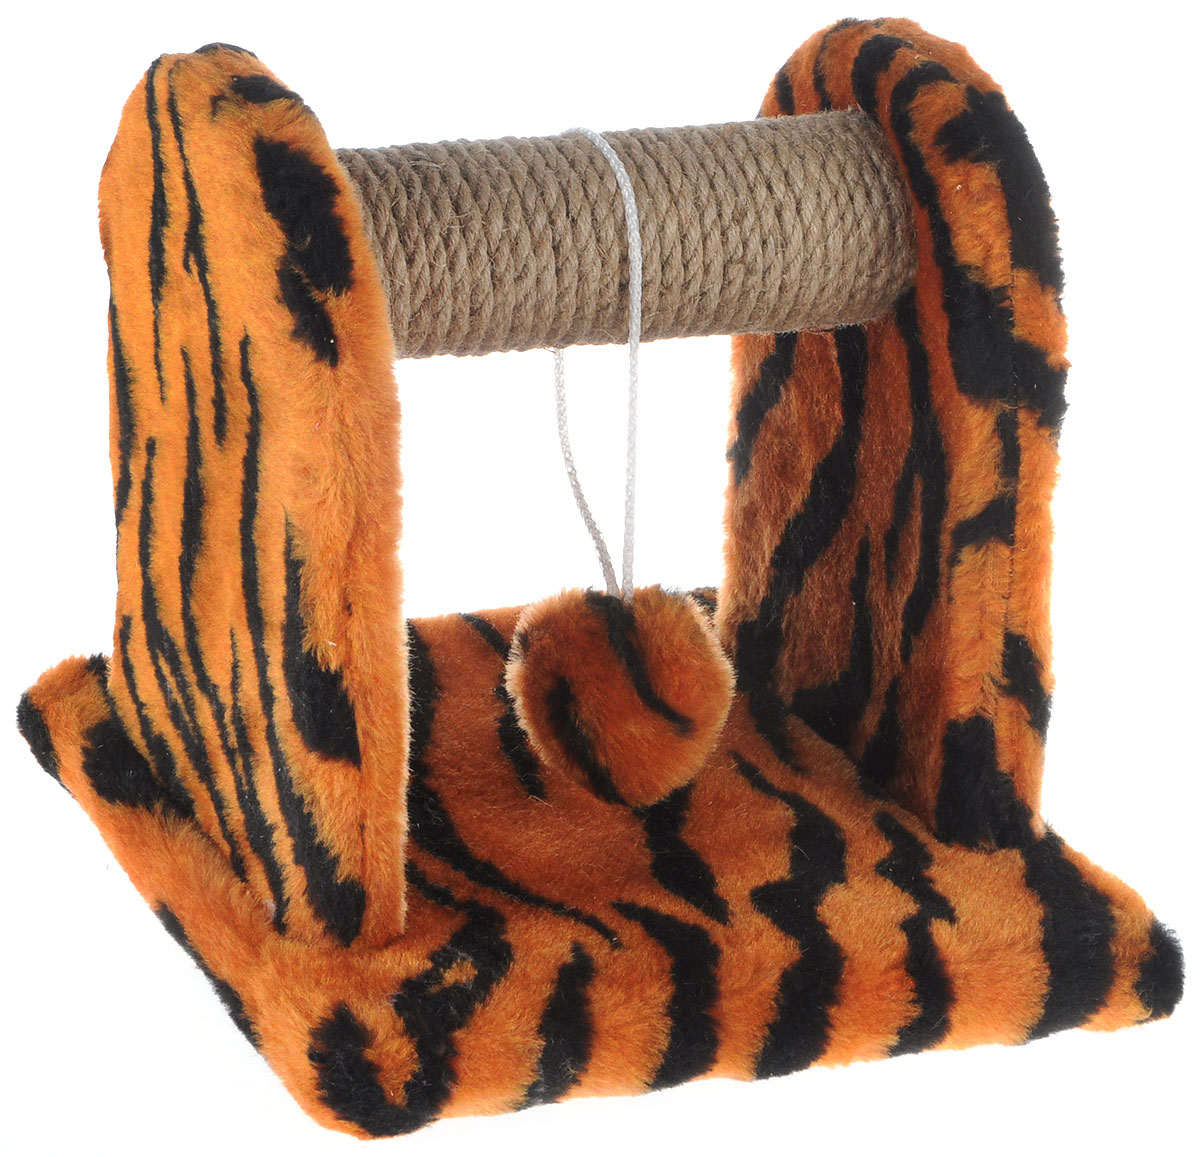 Когтеточка для котят Меридиан  Тигровая , с игрушкой, 26 х 26 х 26 см